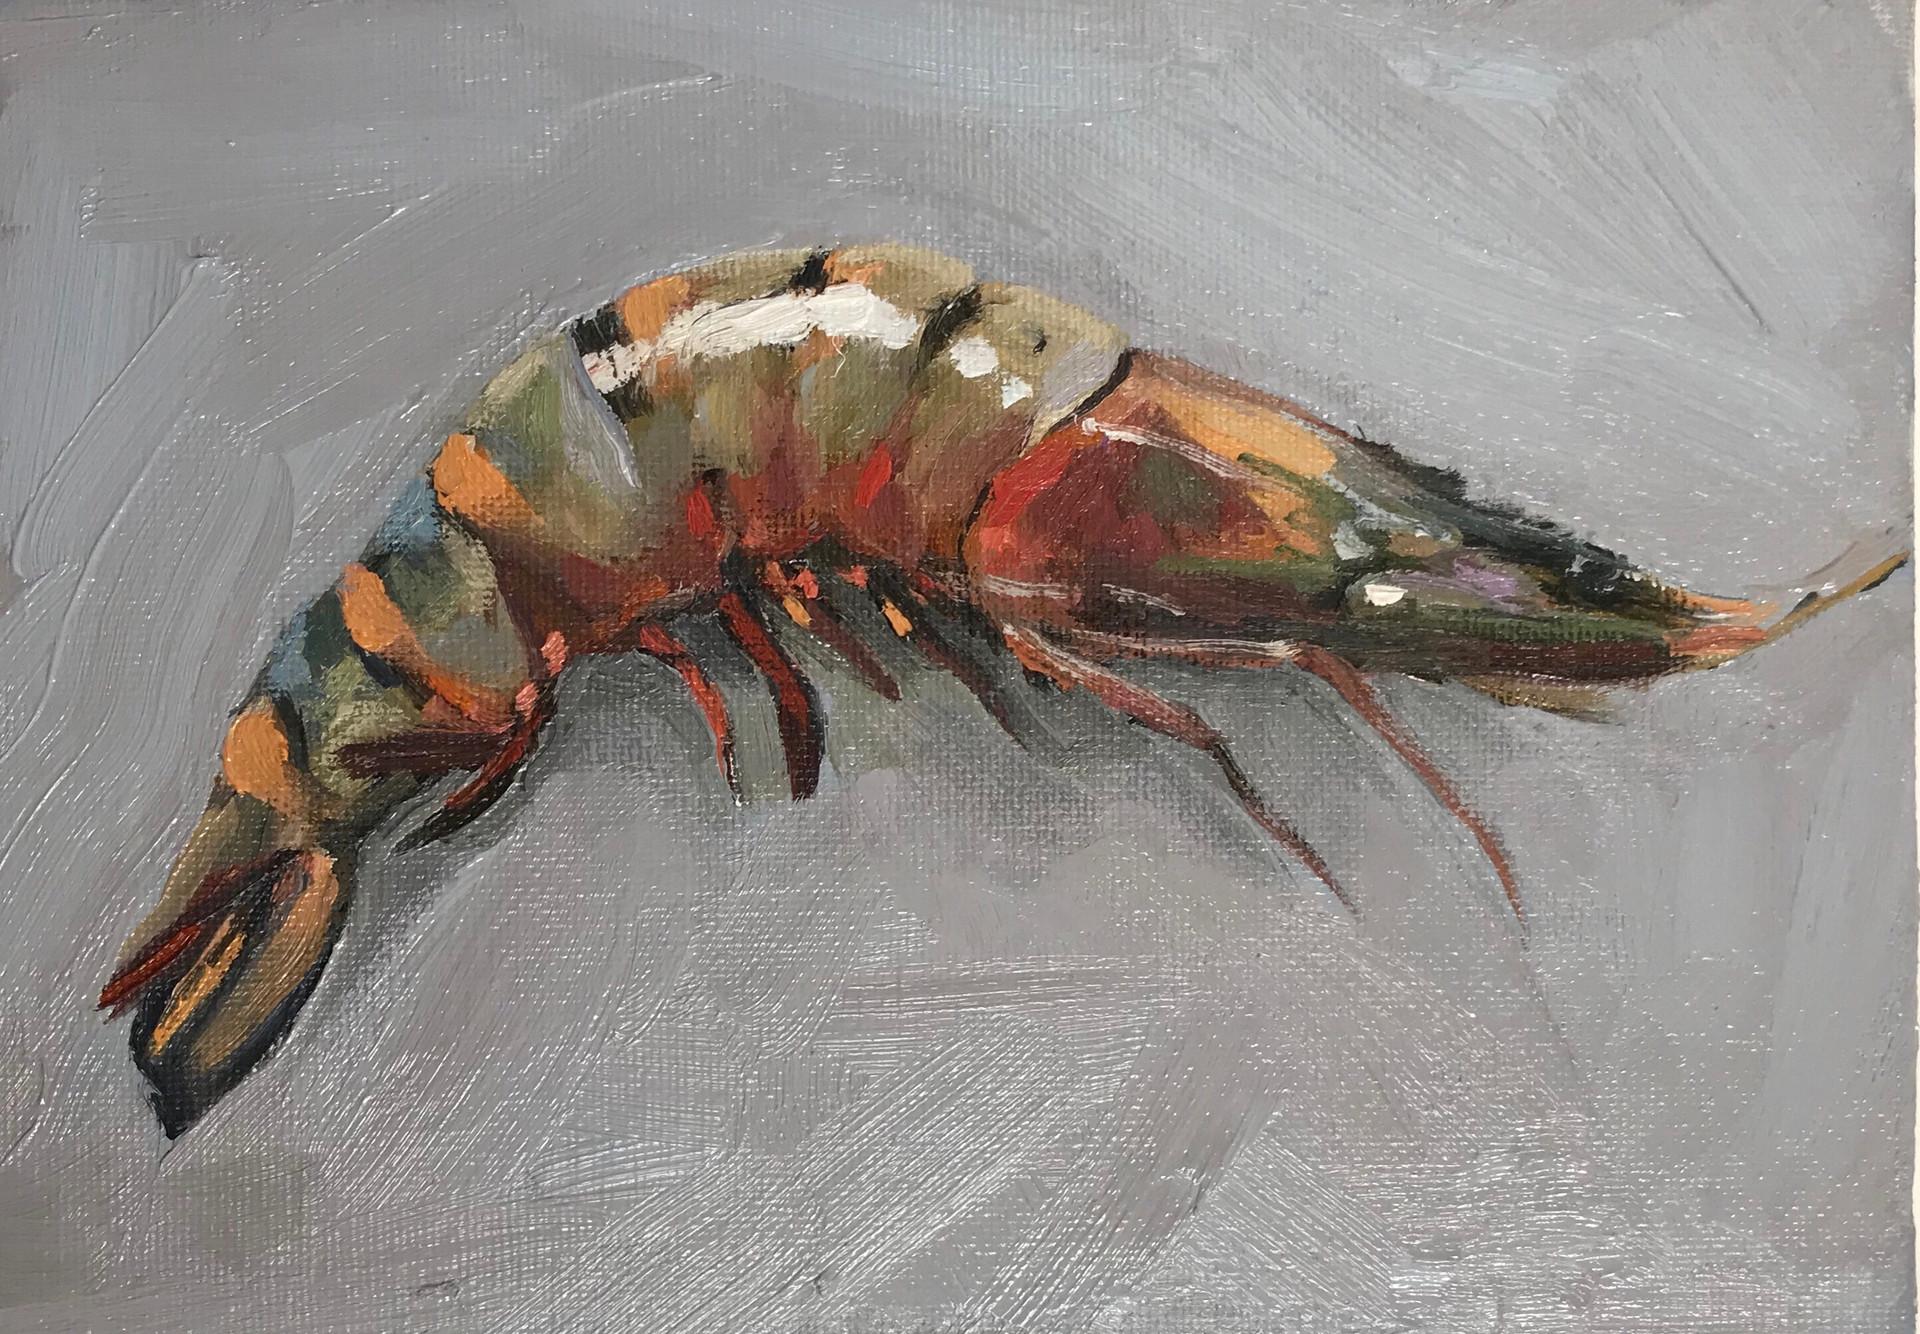 Tiger Prawn, oil on board, 20x15cm, SOLD